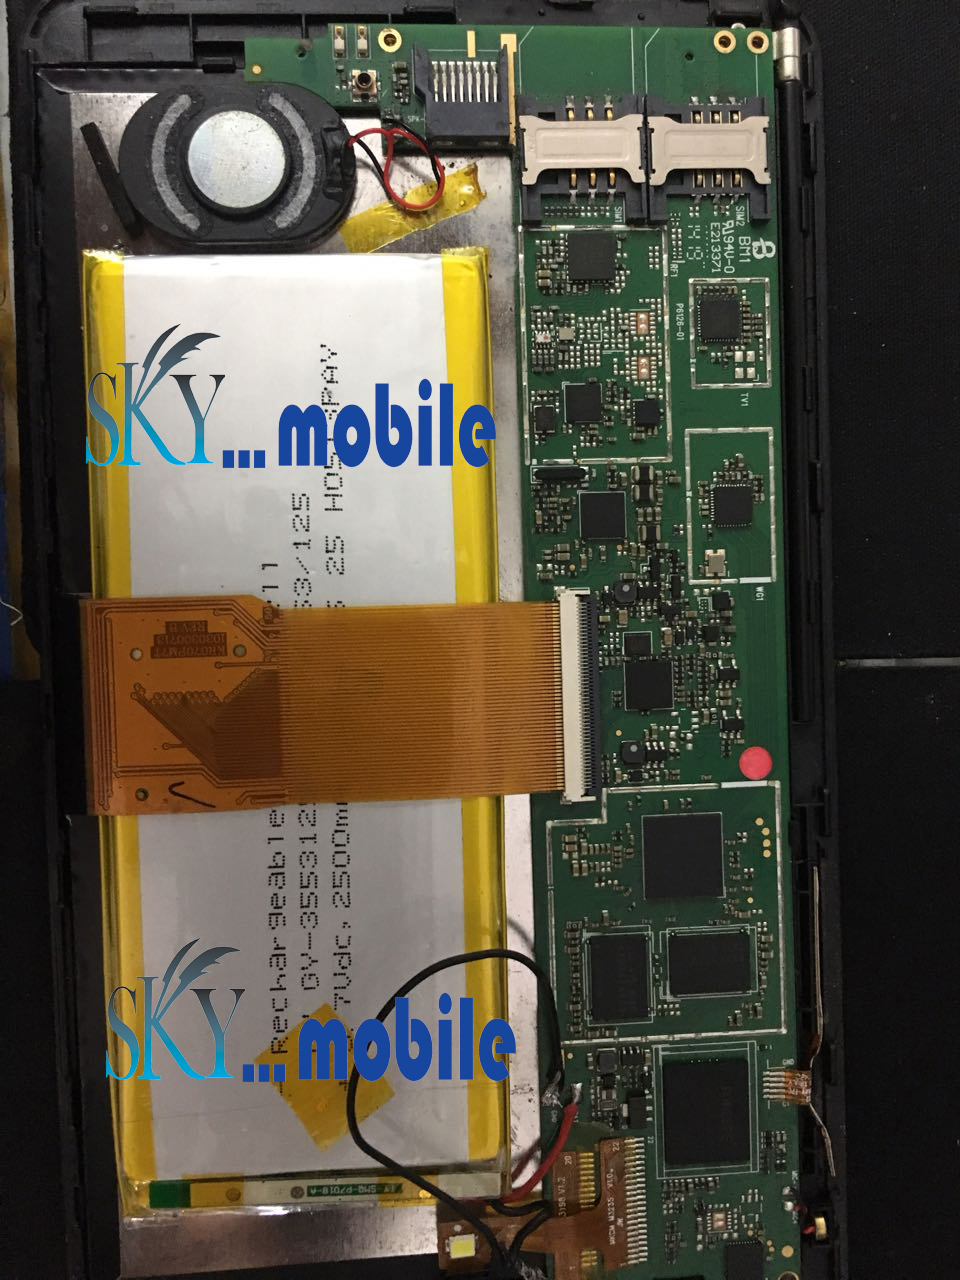 🔥 Slanka Flash files: Zigo Nebula 6 9 Flash File Firmware